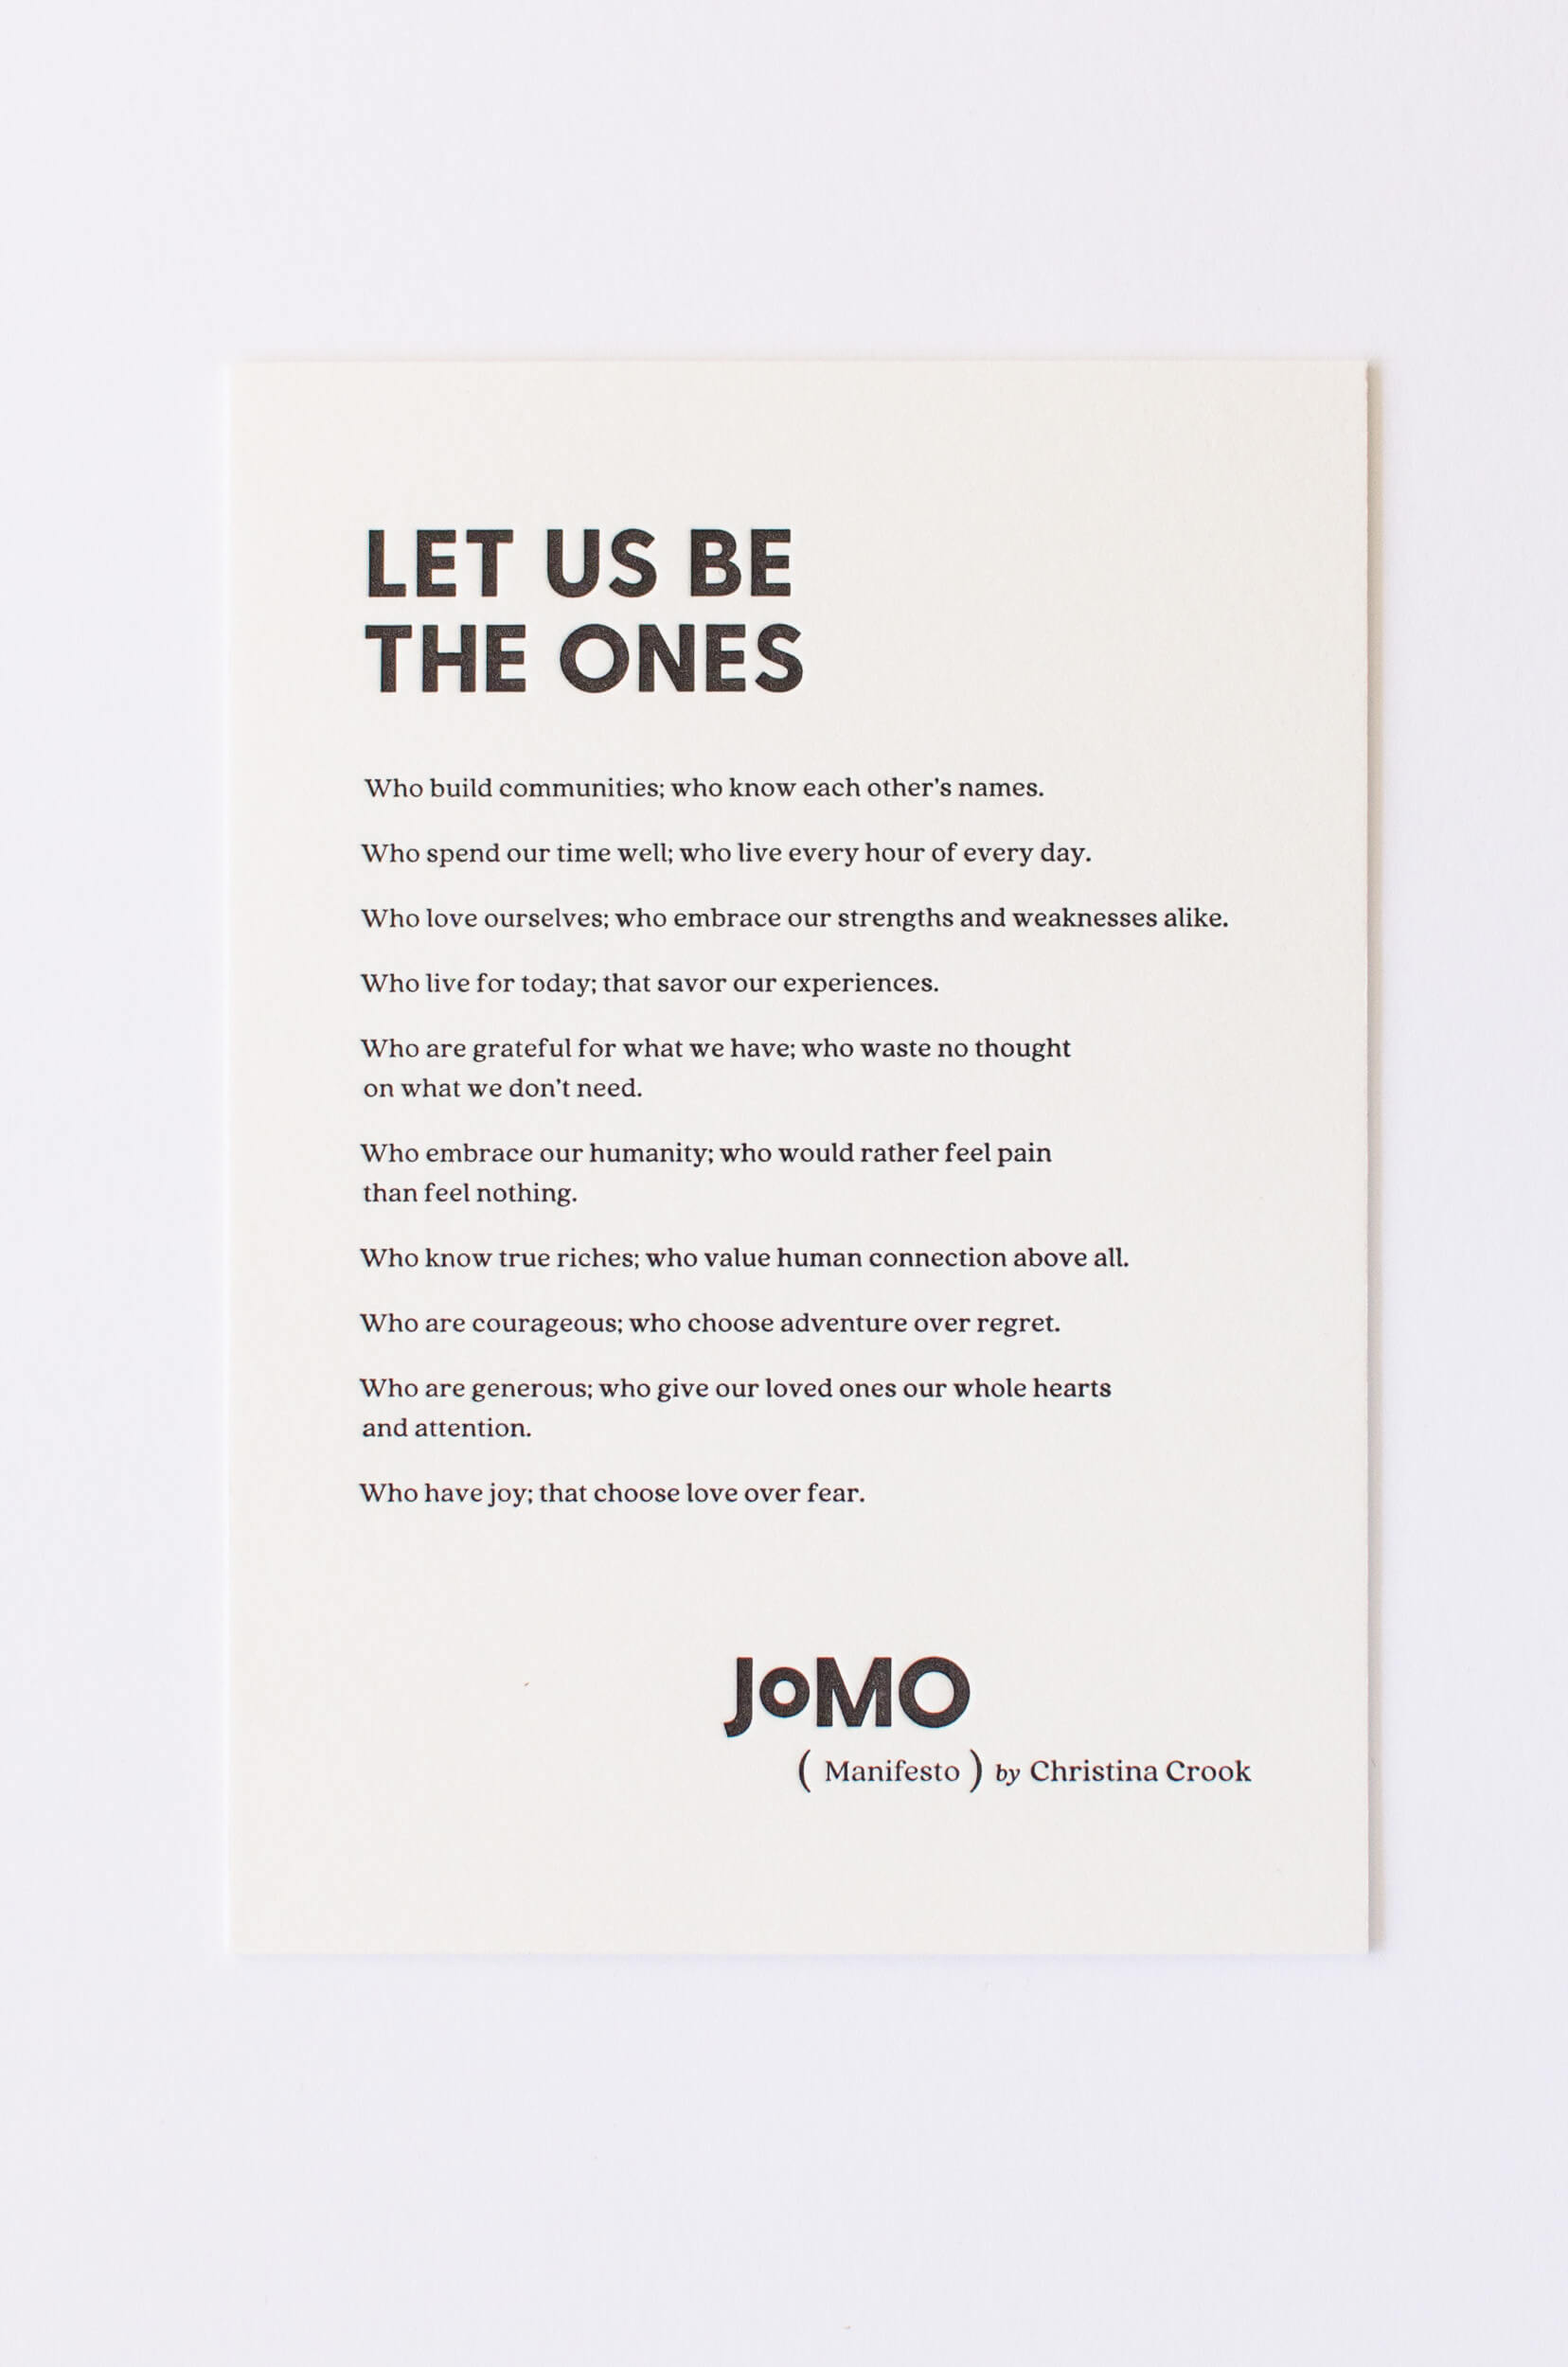 jomo-letterpress-manifesto.jpg